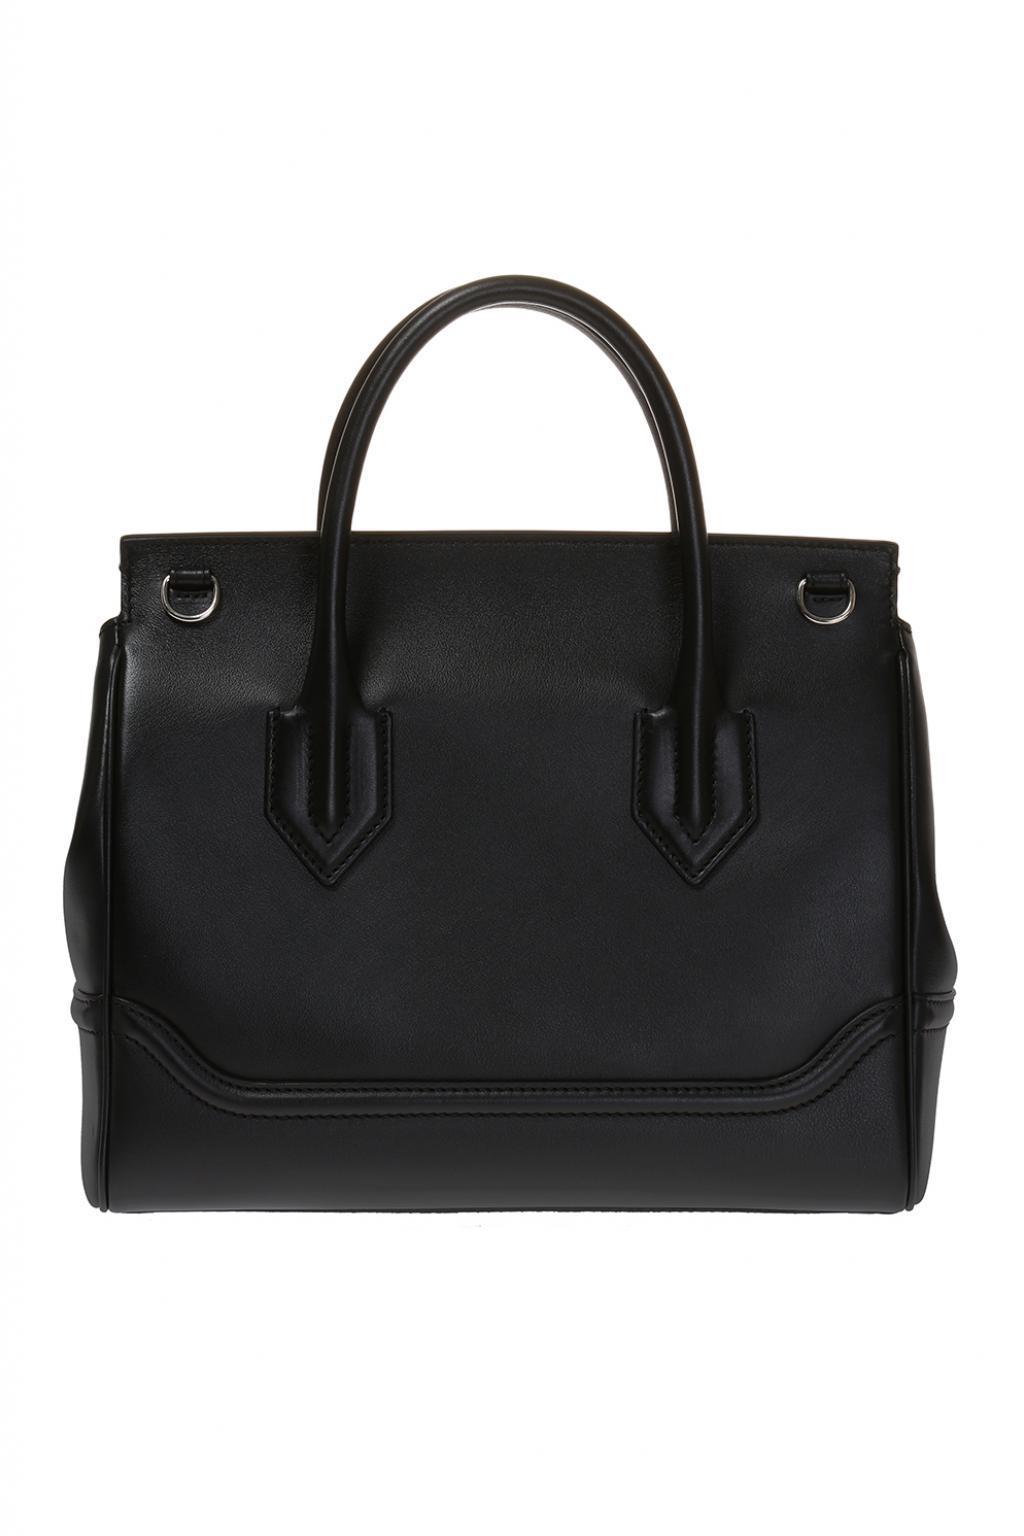 48c65e20bb93 Versace Medusa Head Shoulder Bag in Black - Lyst